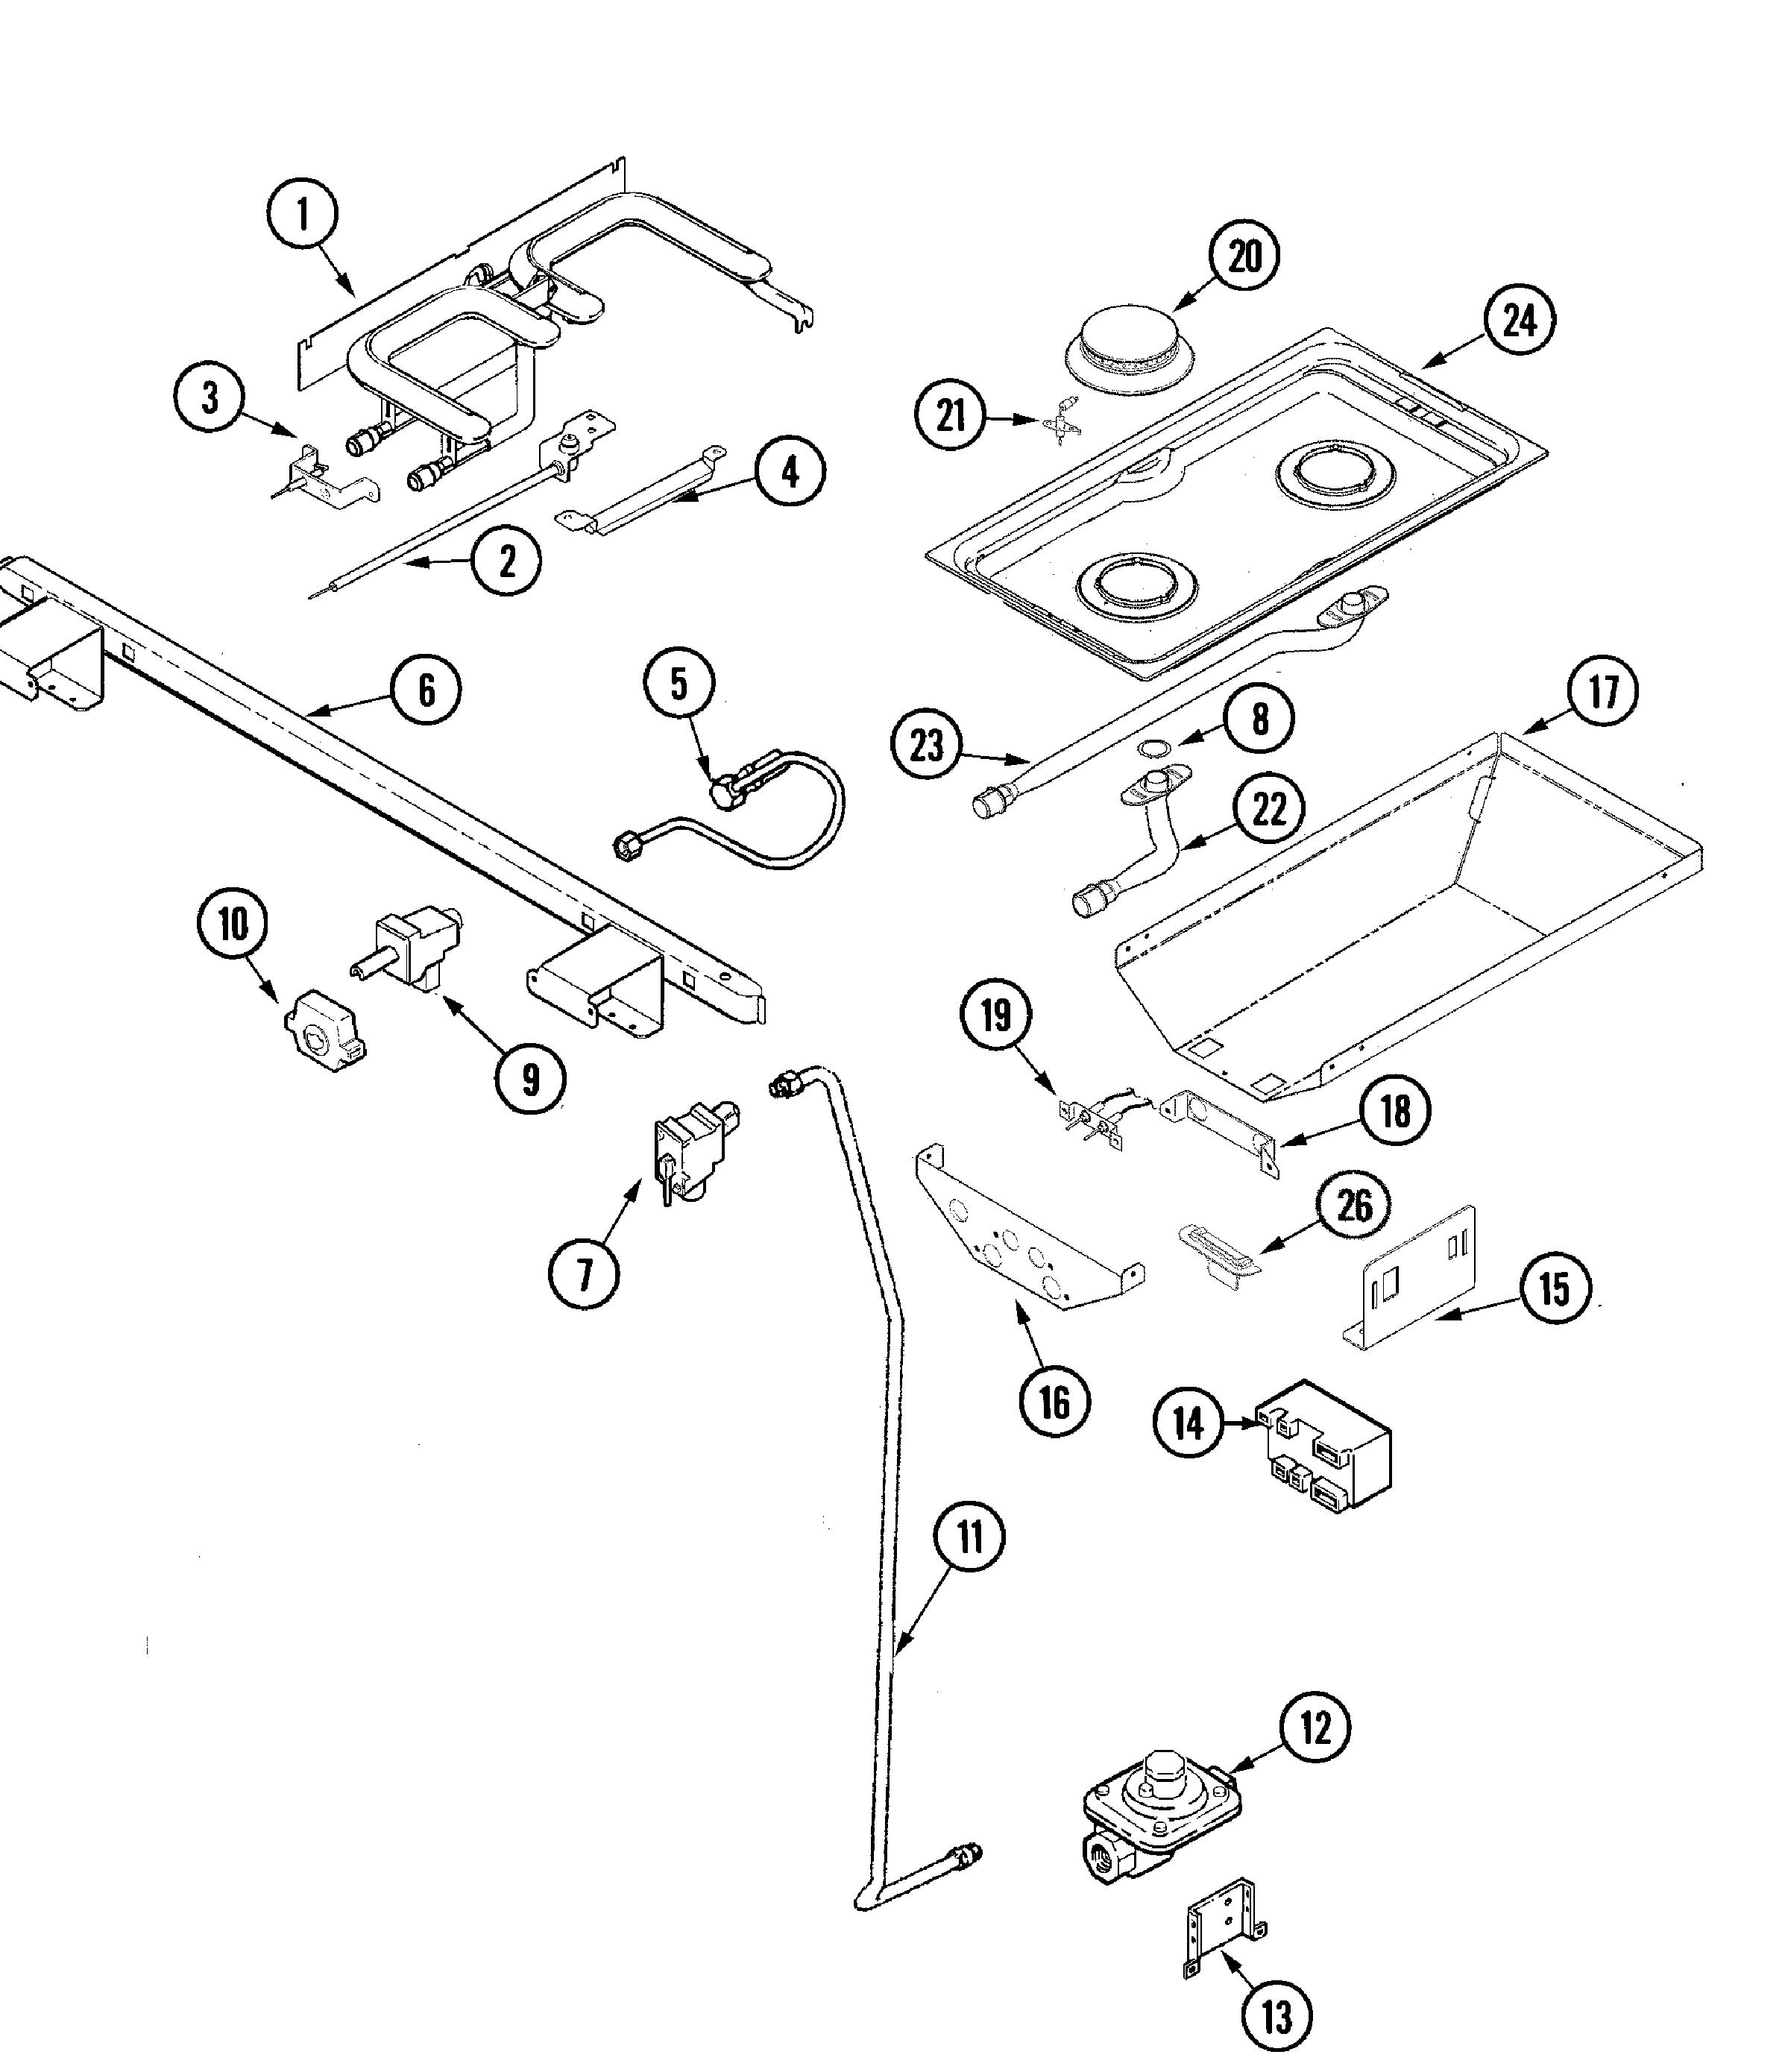 Jenn Air Jds9860aab Slide In Dual Fuel Downdraft Range